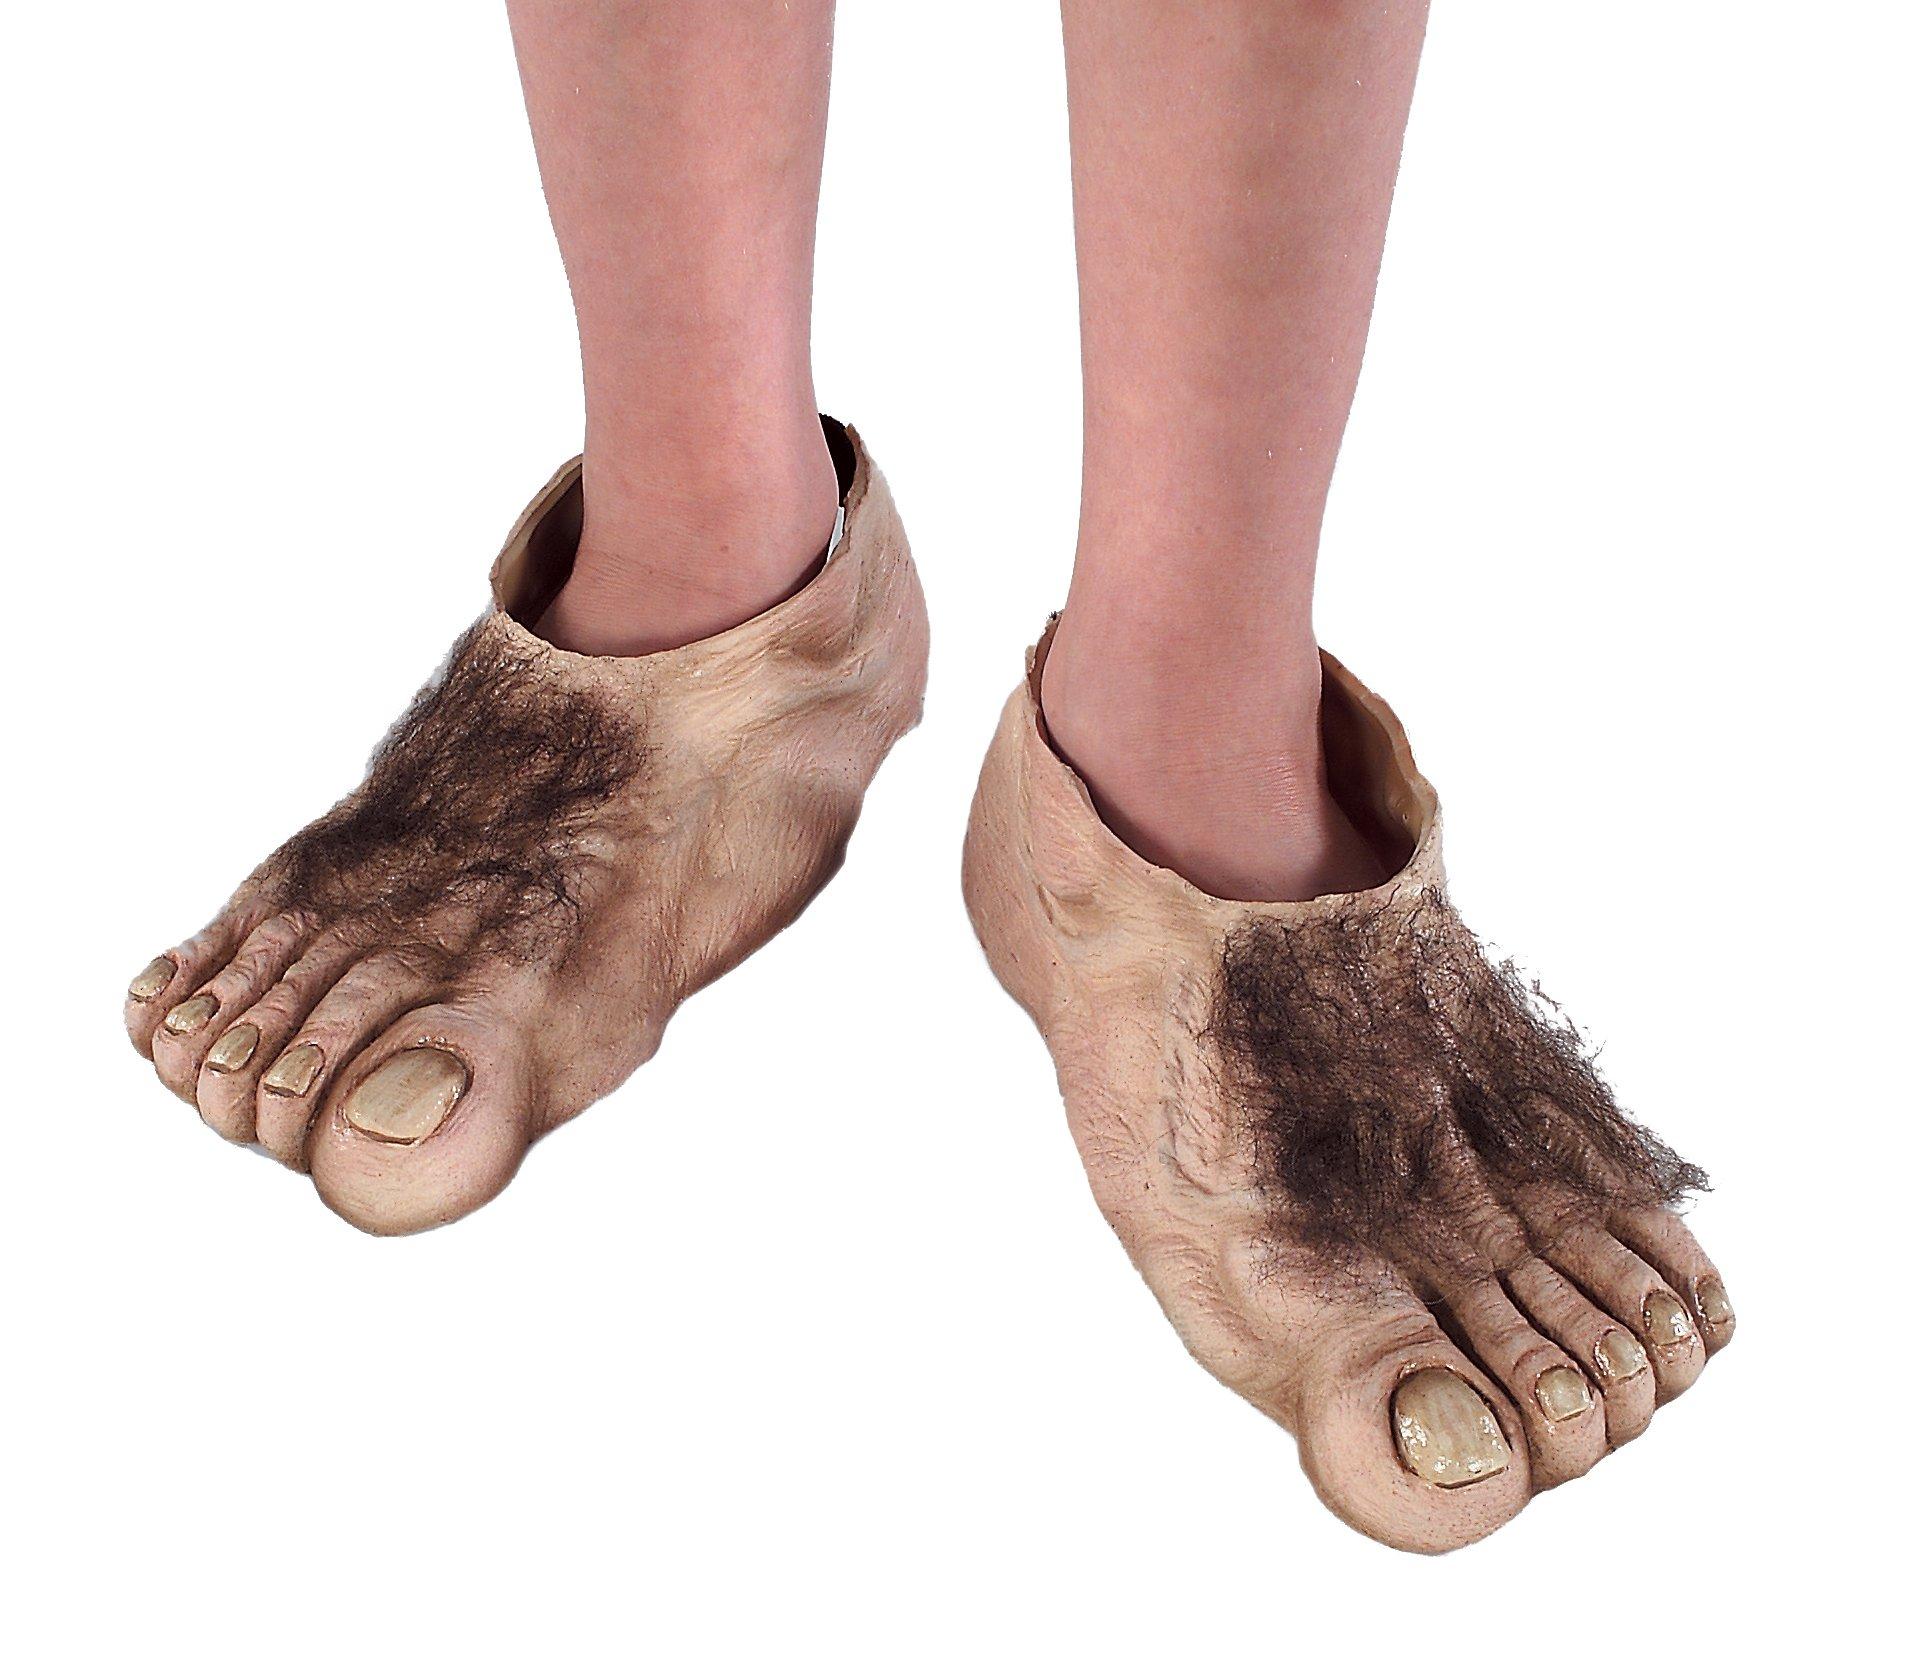 The Hobbit Feet by Rubie's